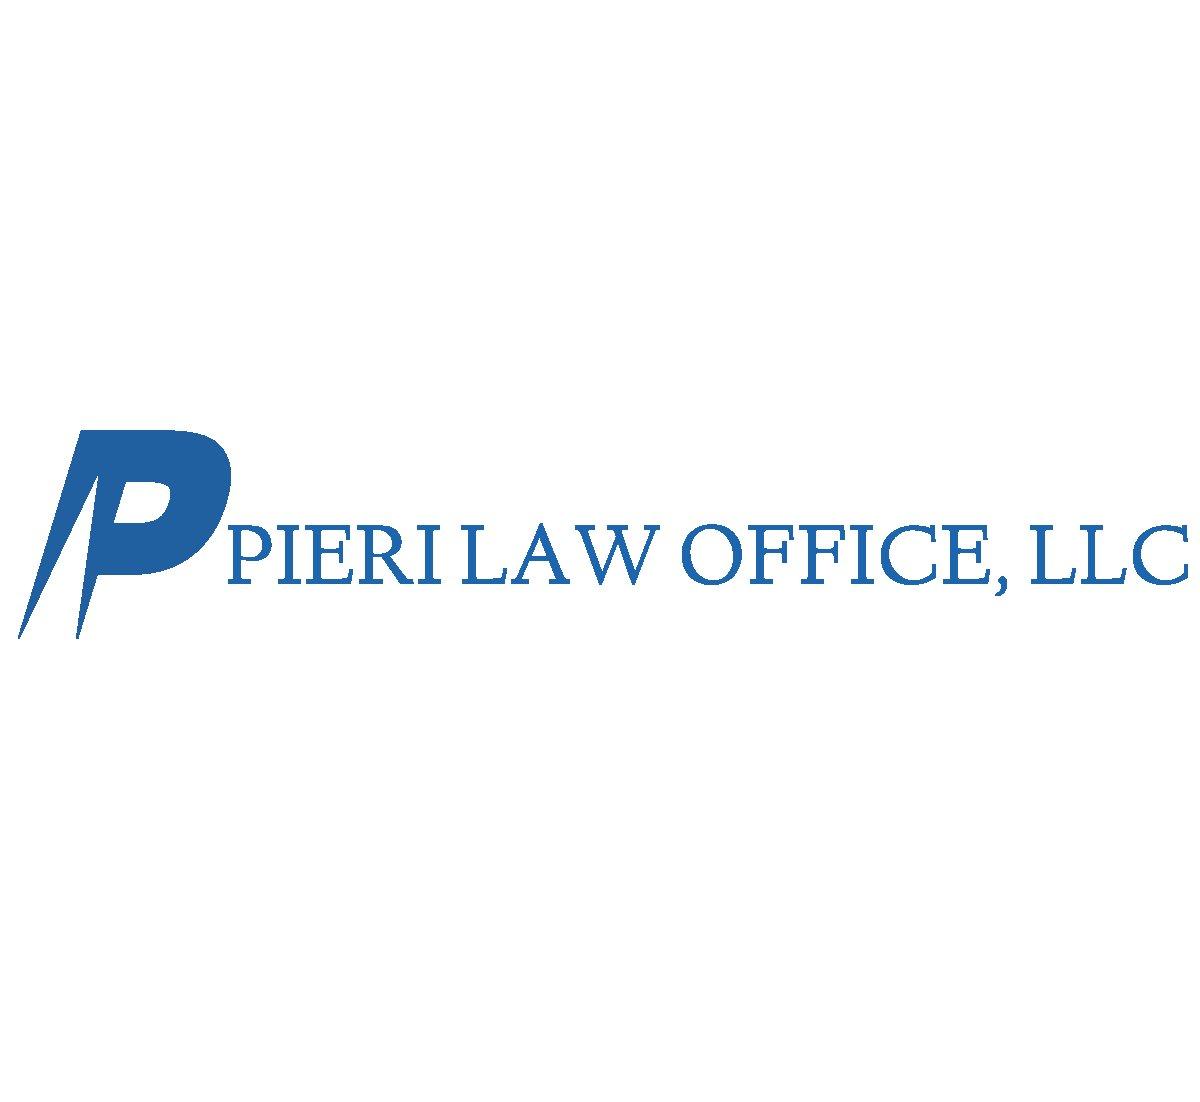 Pieri Law Office, LLC